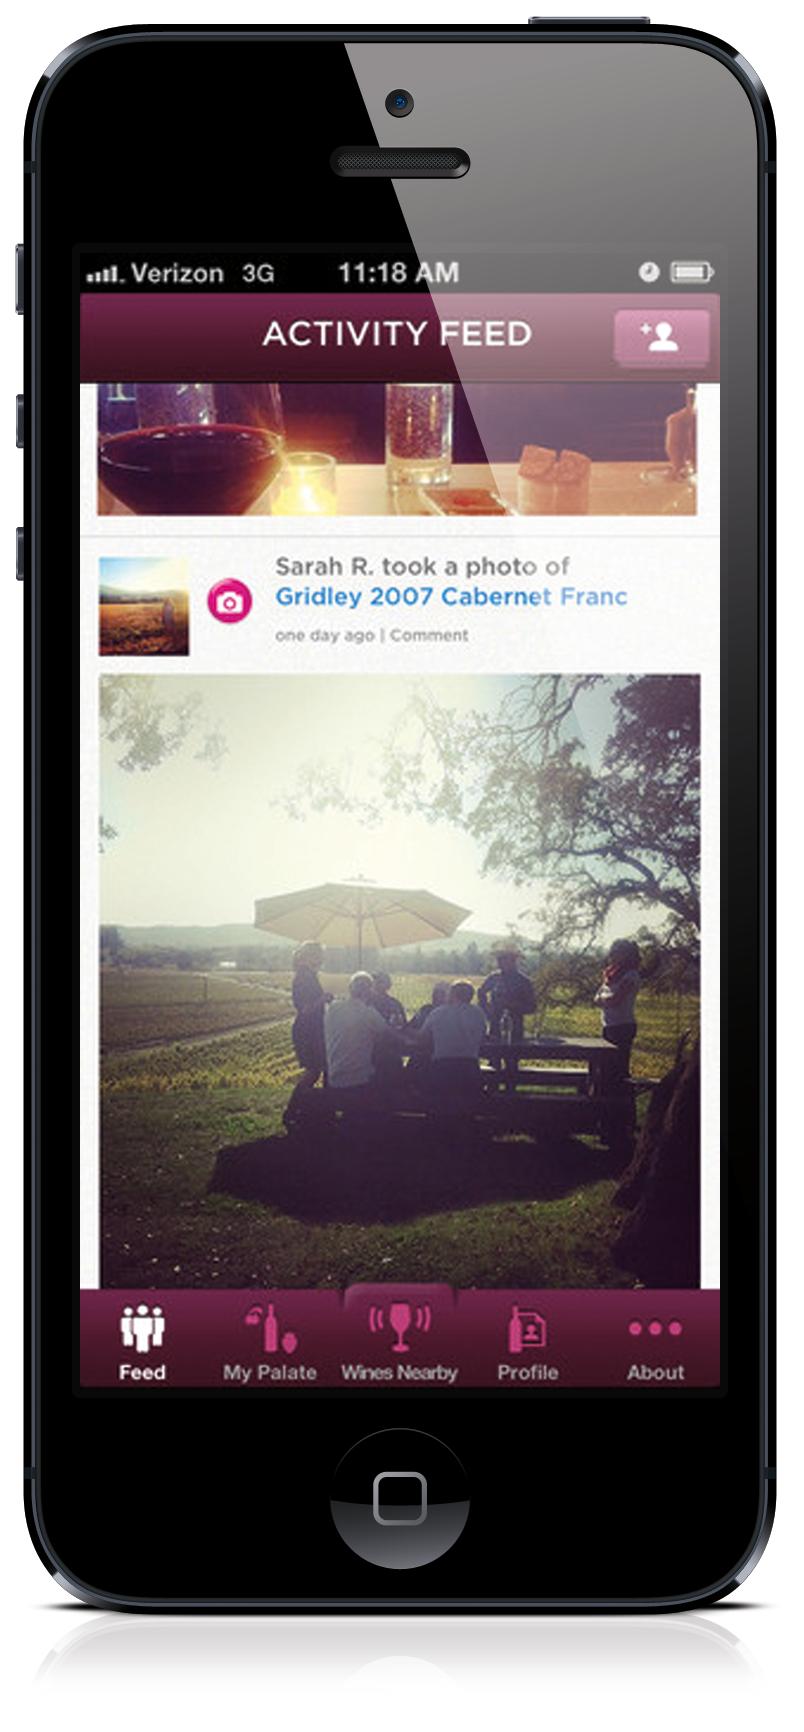 Swirl it! Taste-Based wine Recommendation App - image 3 - student project